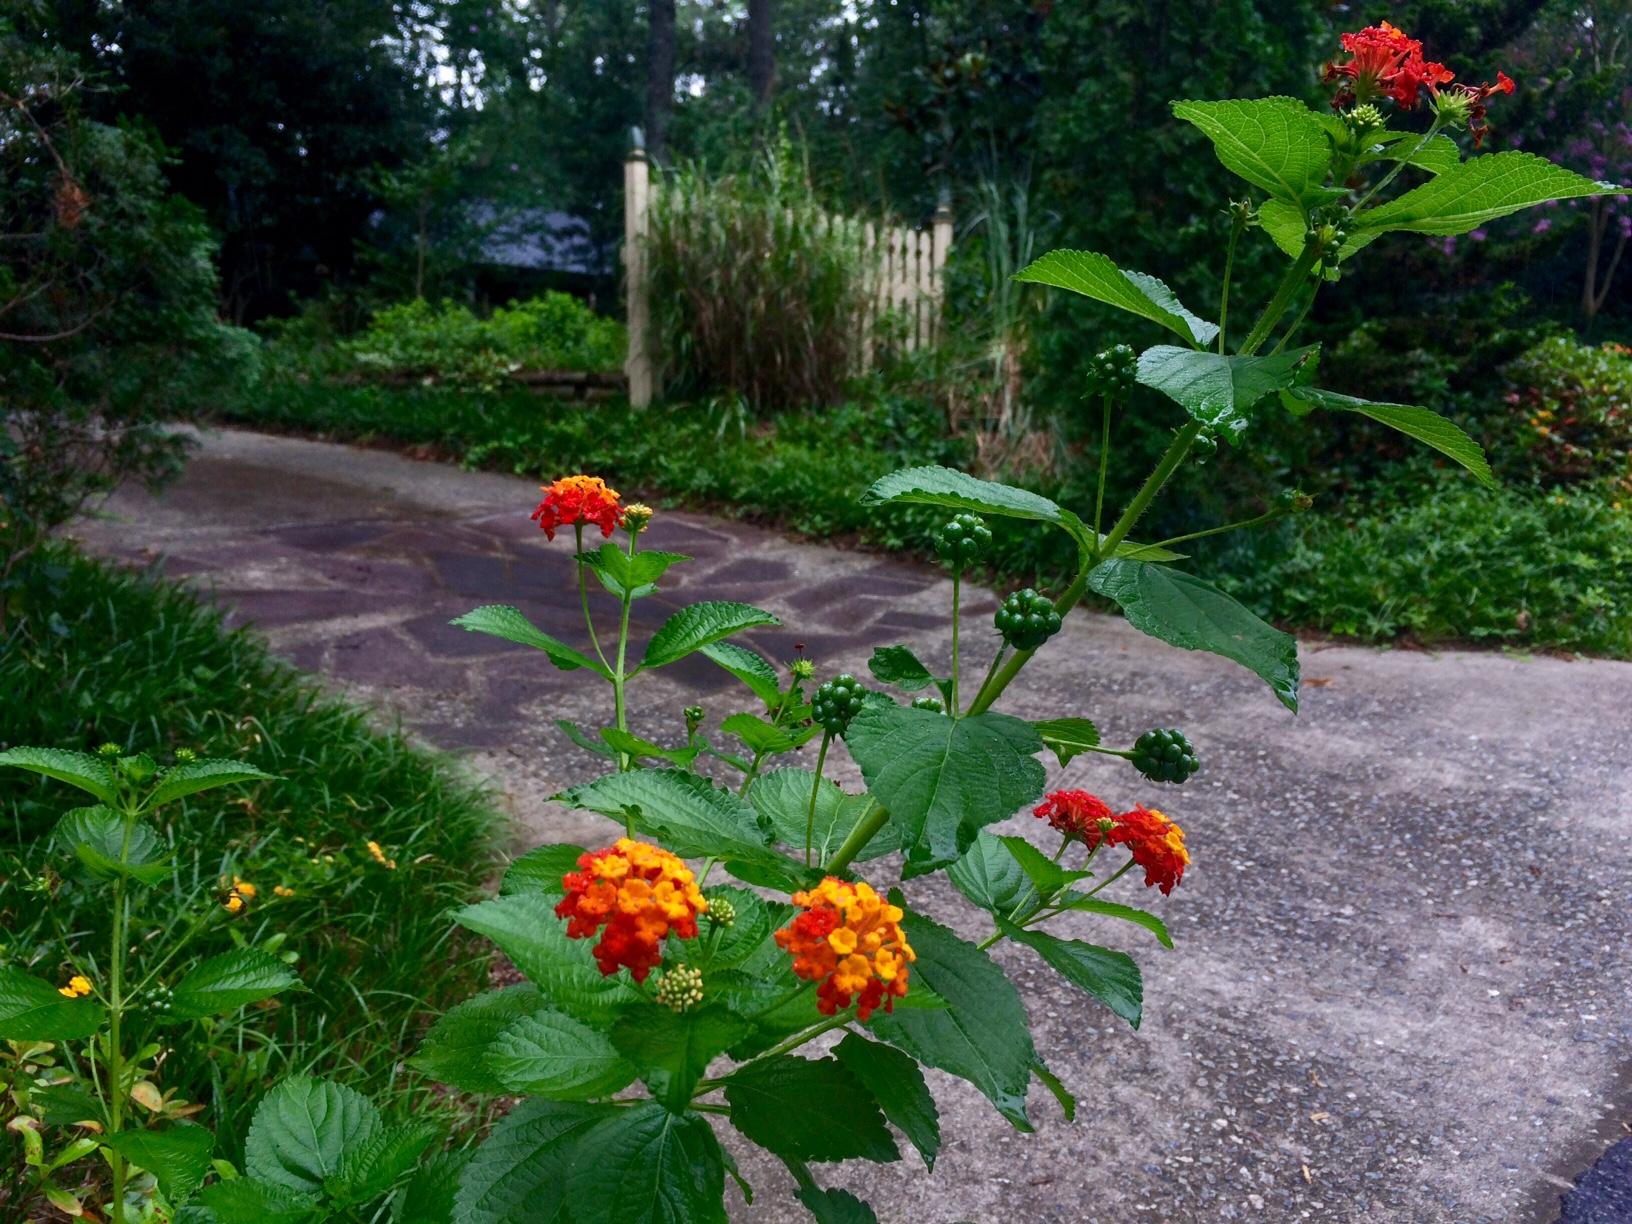 Beautiful flowers and driveway in neighborhood 7.2017